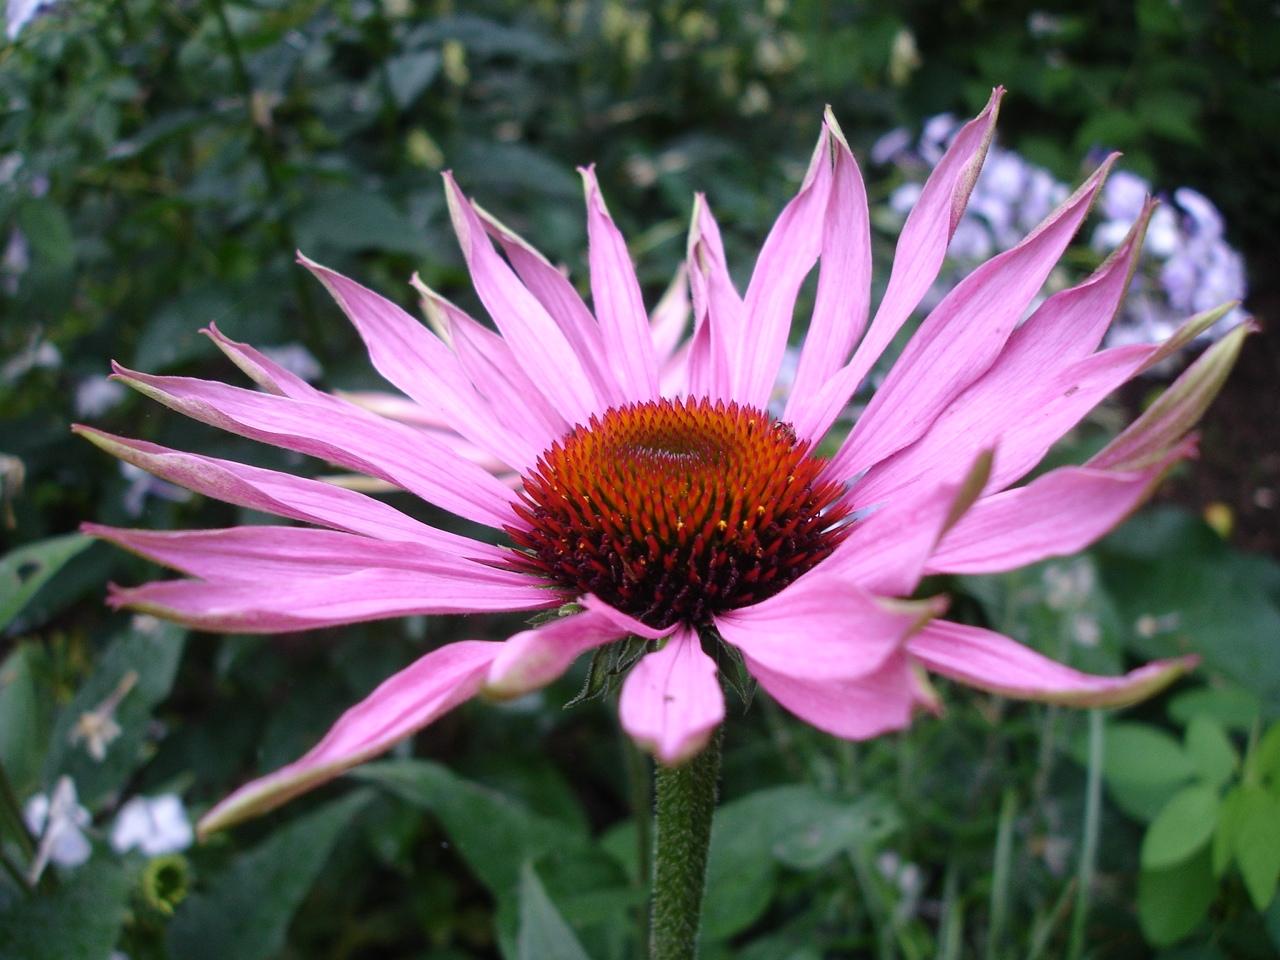 Flowers Echinacea purpurea